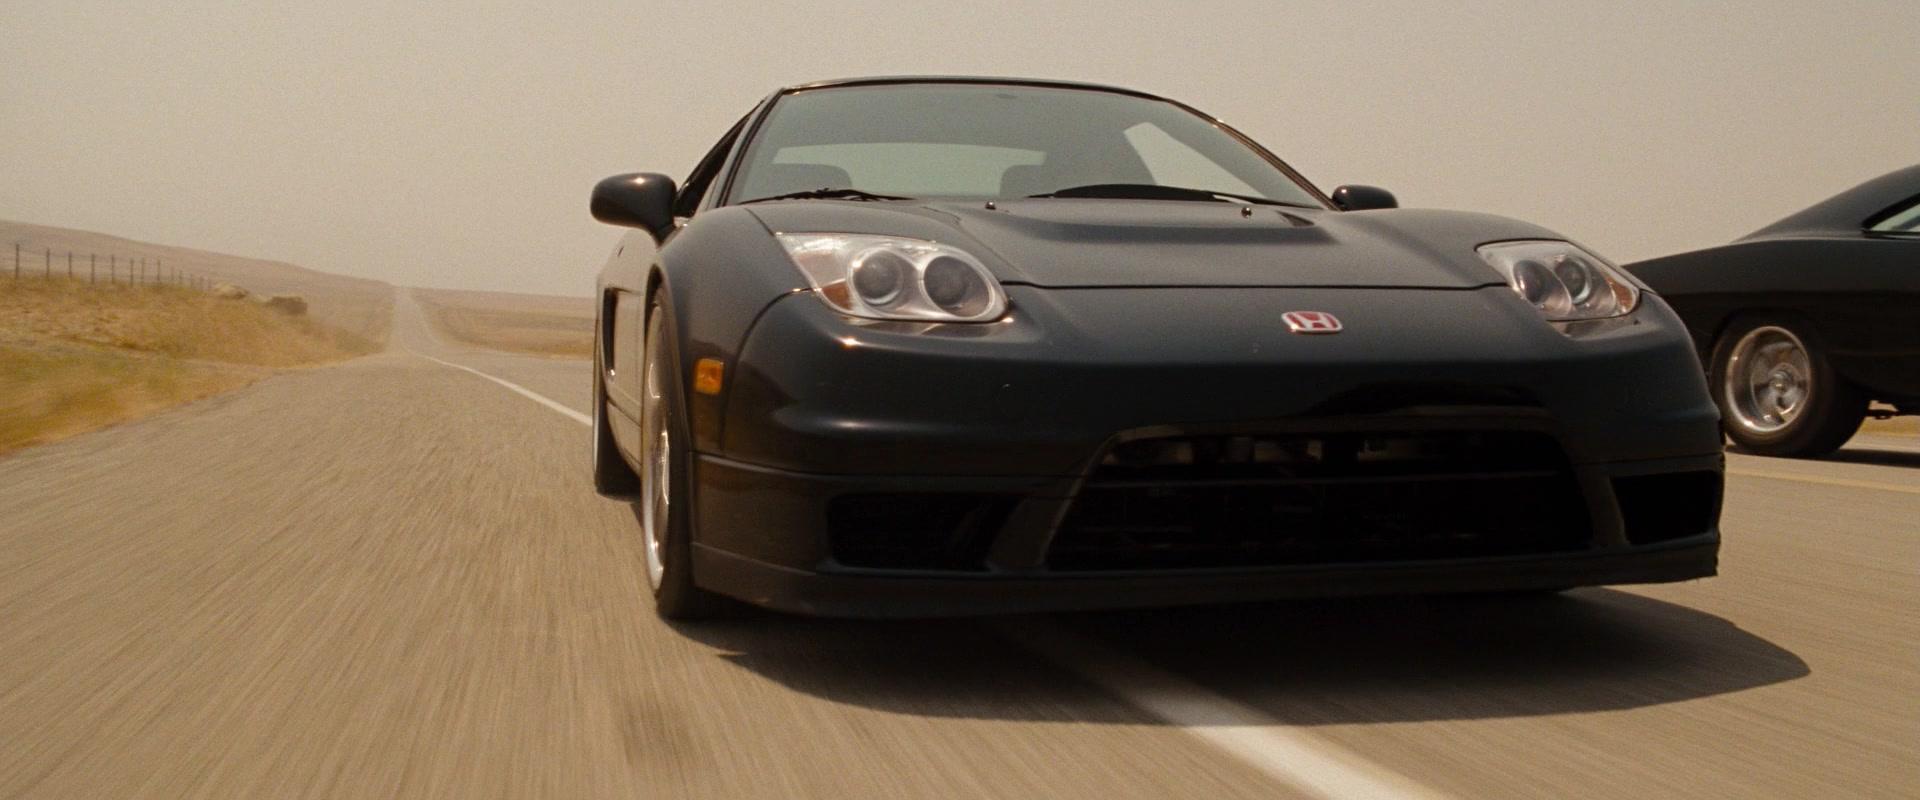 Honda Acura Nsx Car Of Jordana Brewster As Mia Toretto In Fast Furious 2009